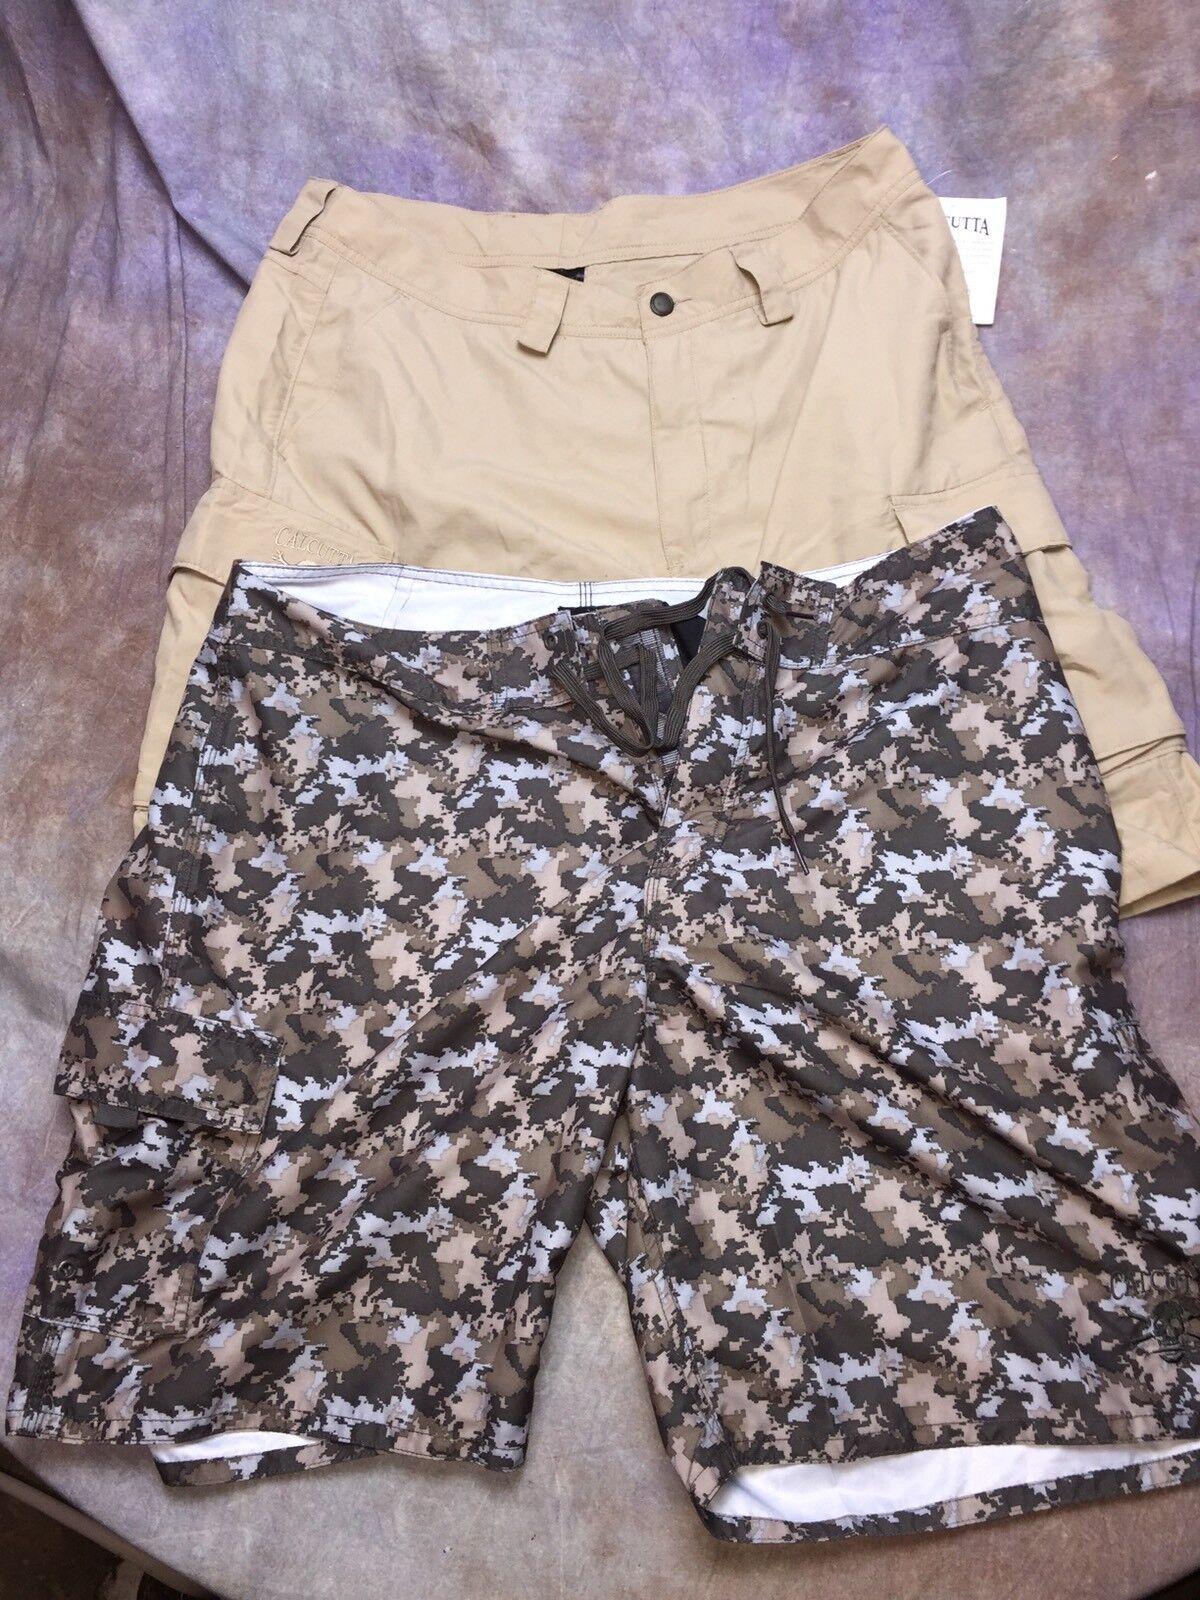 SAH lot 2 pairs NEW Calcutta Fishing Swimming Board Shorts Men  NEW NWT sz 36